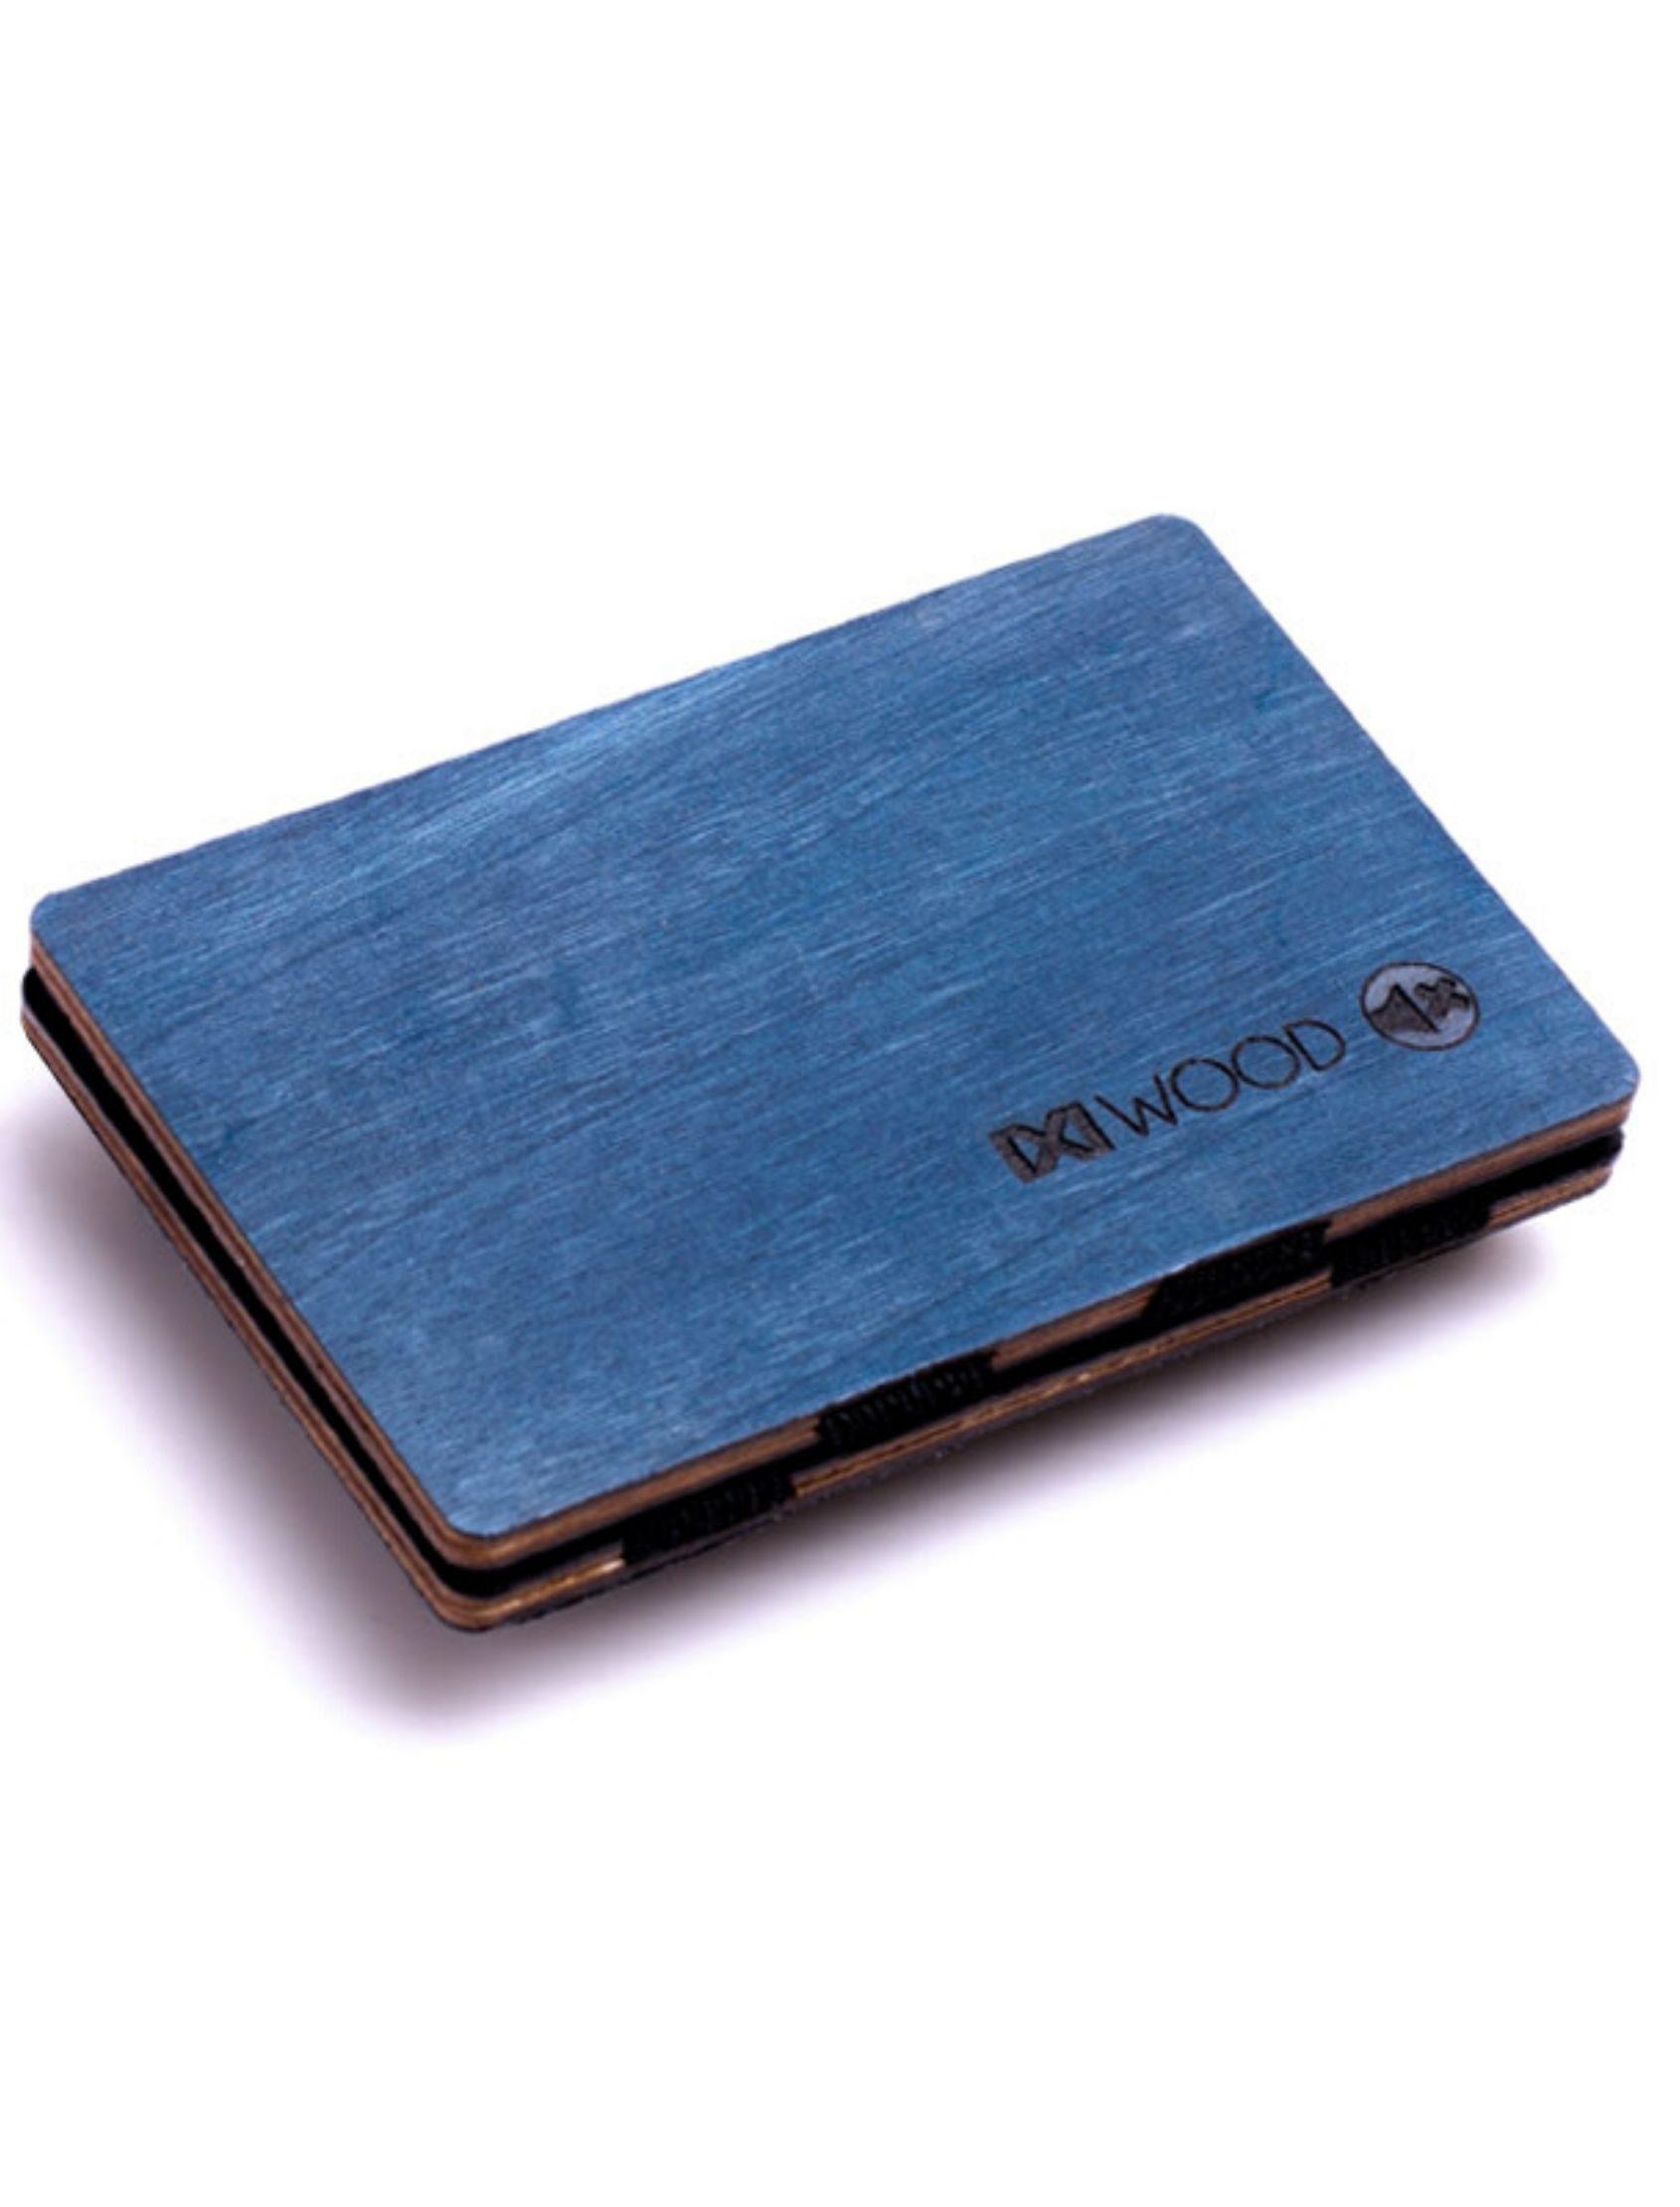 cartera de madera en color azul de IXI WOOD